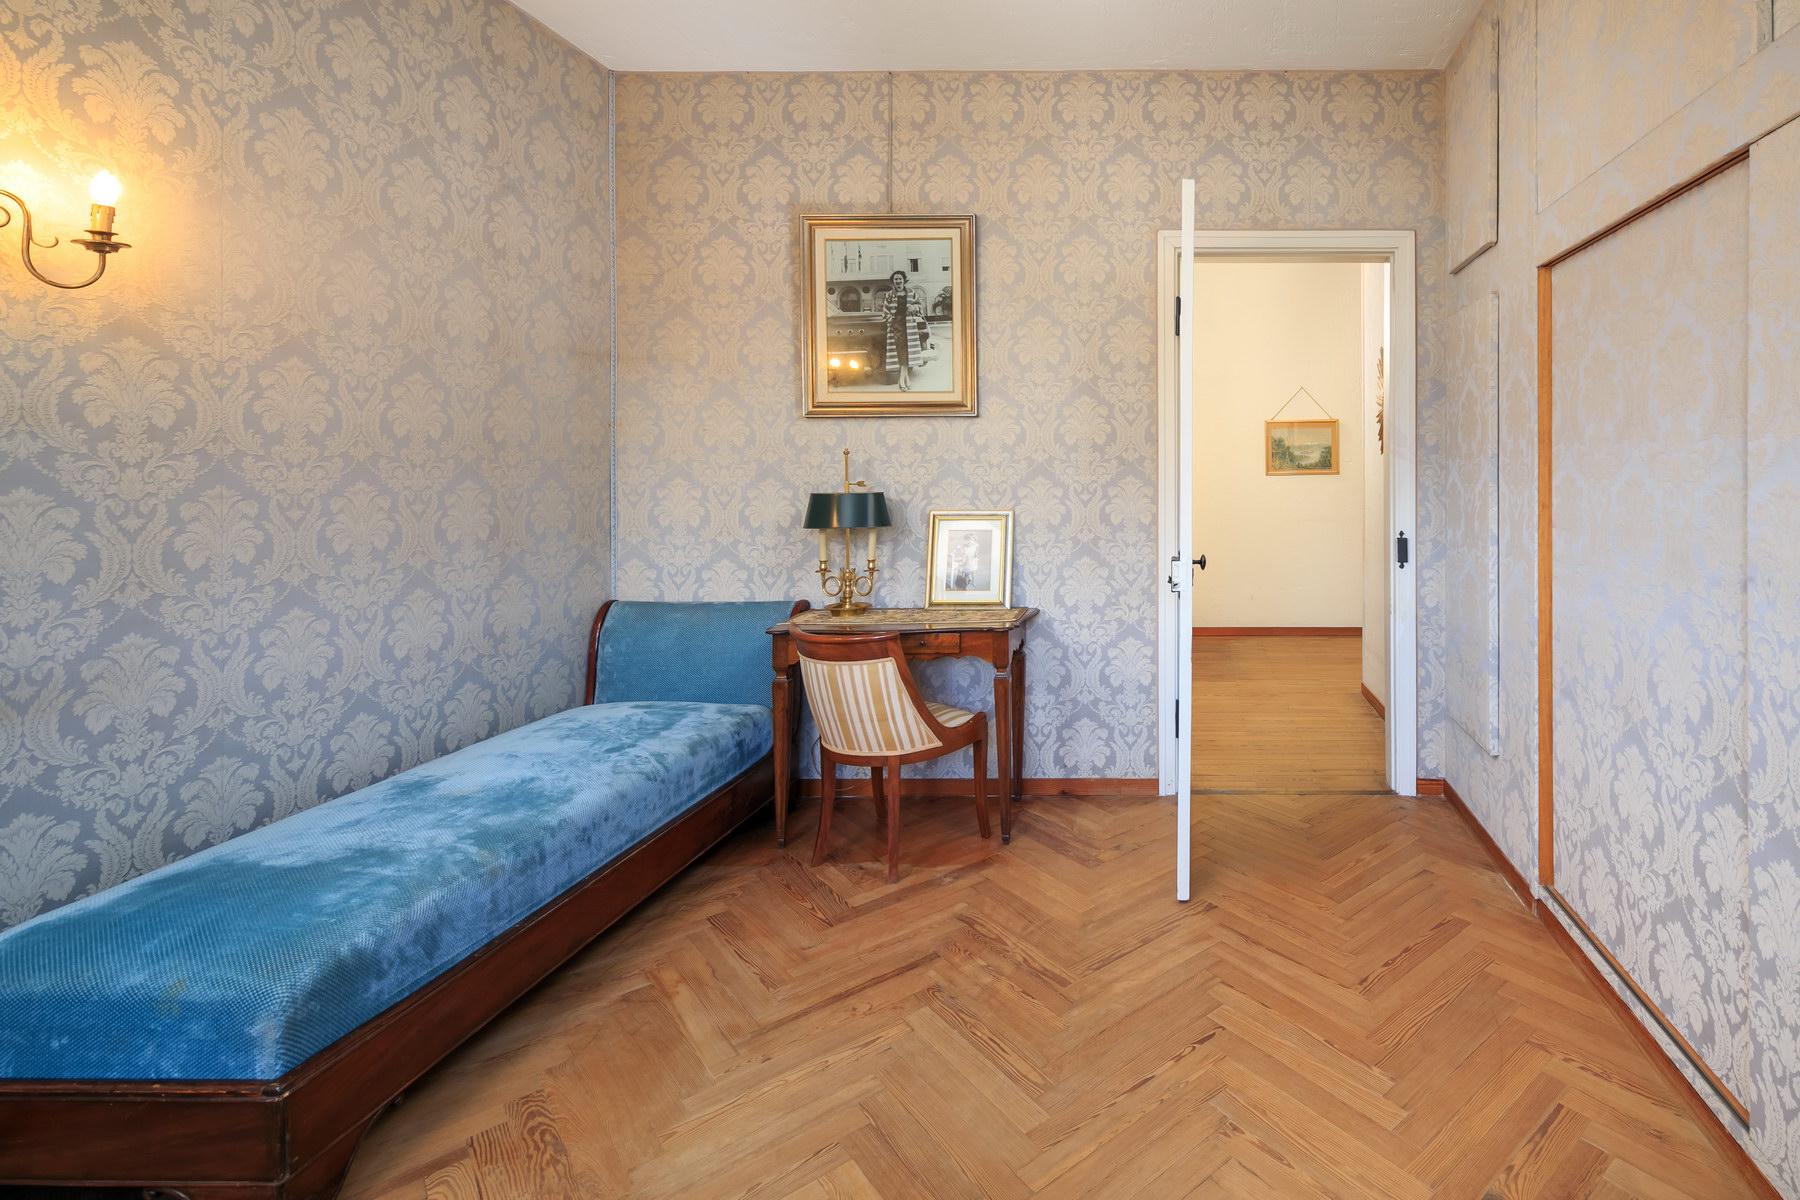 Villa in Vendita a Lerici: 5 locali, 620 mq - Foto 17